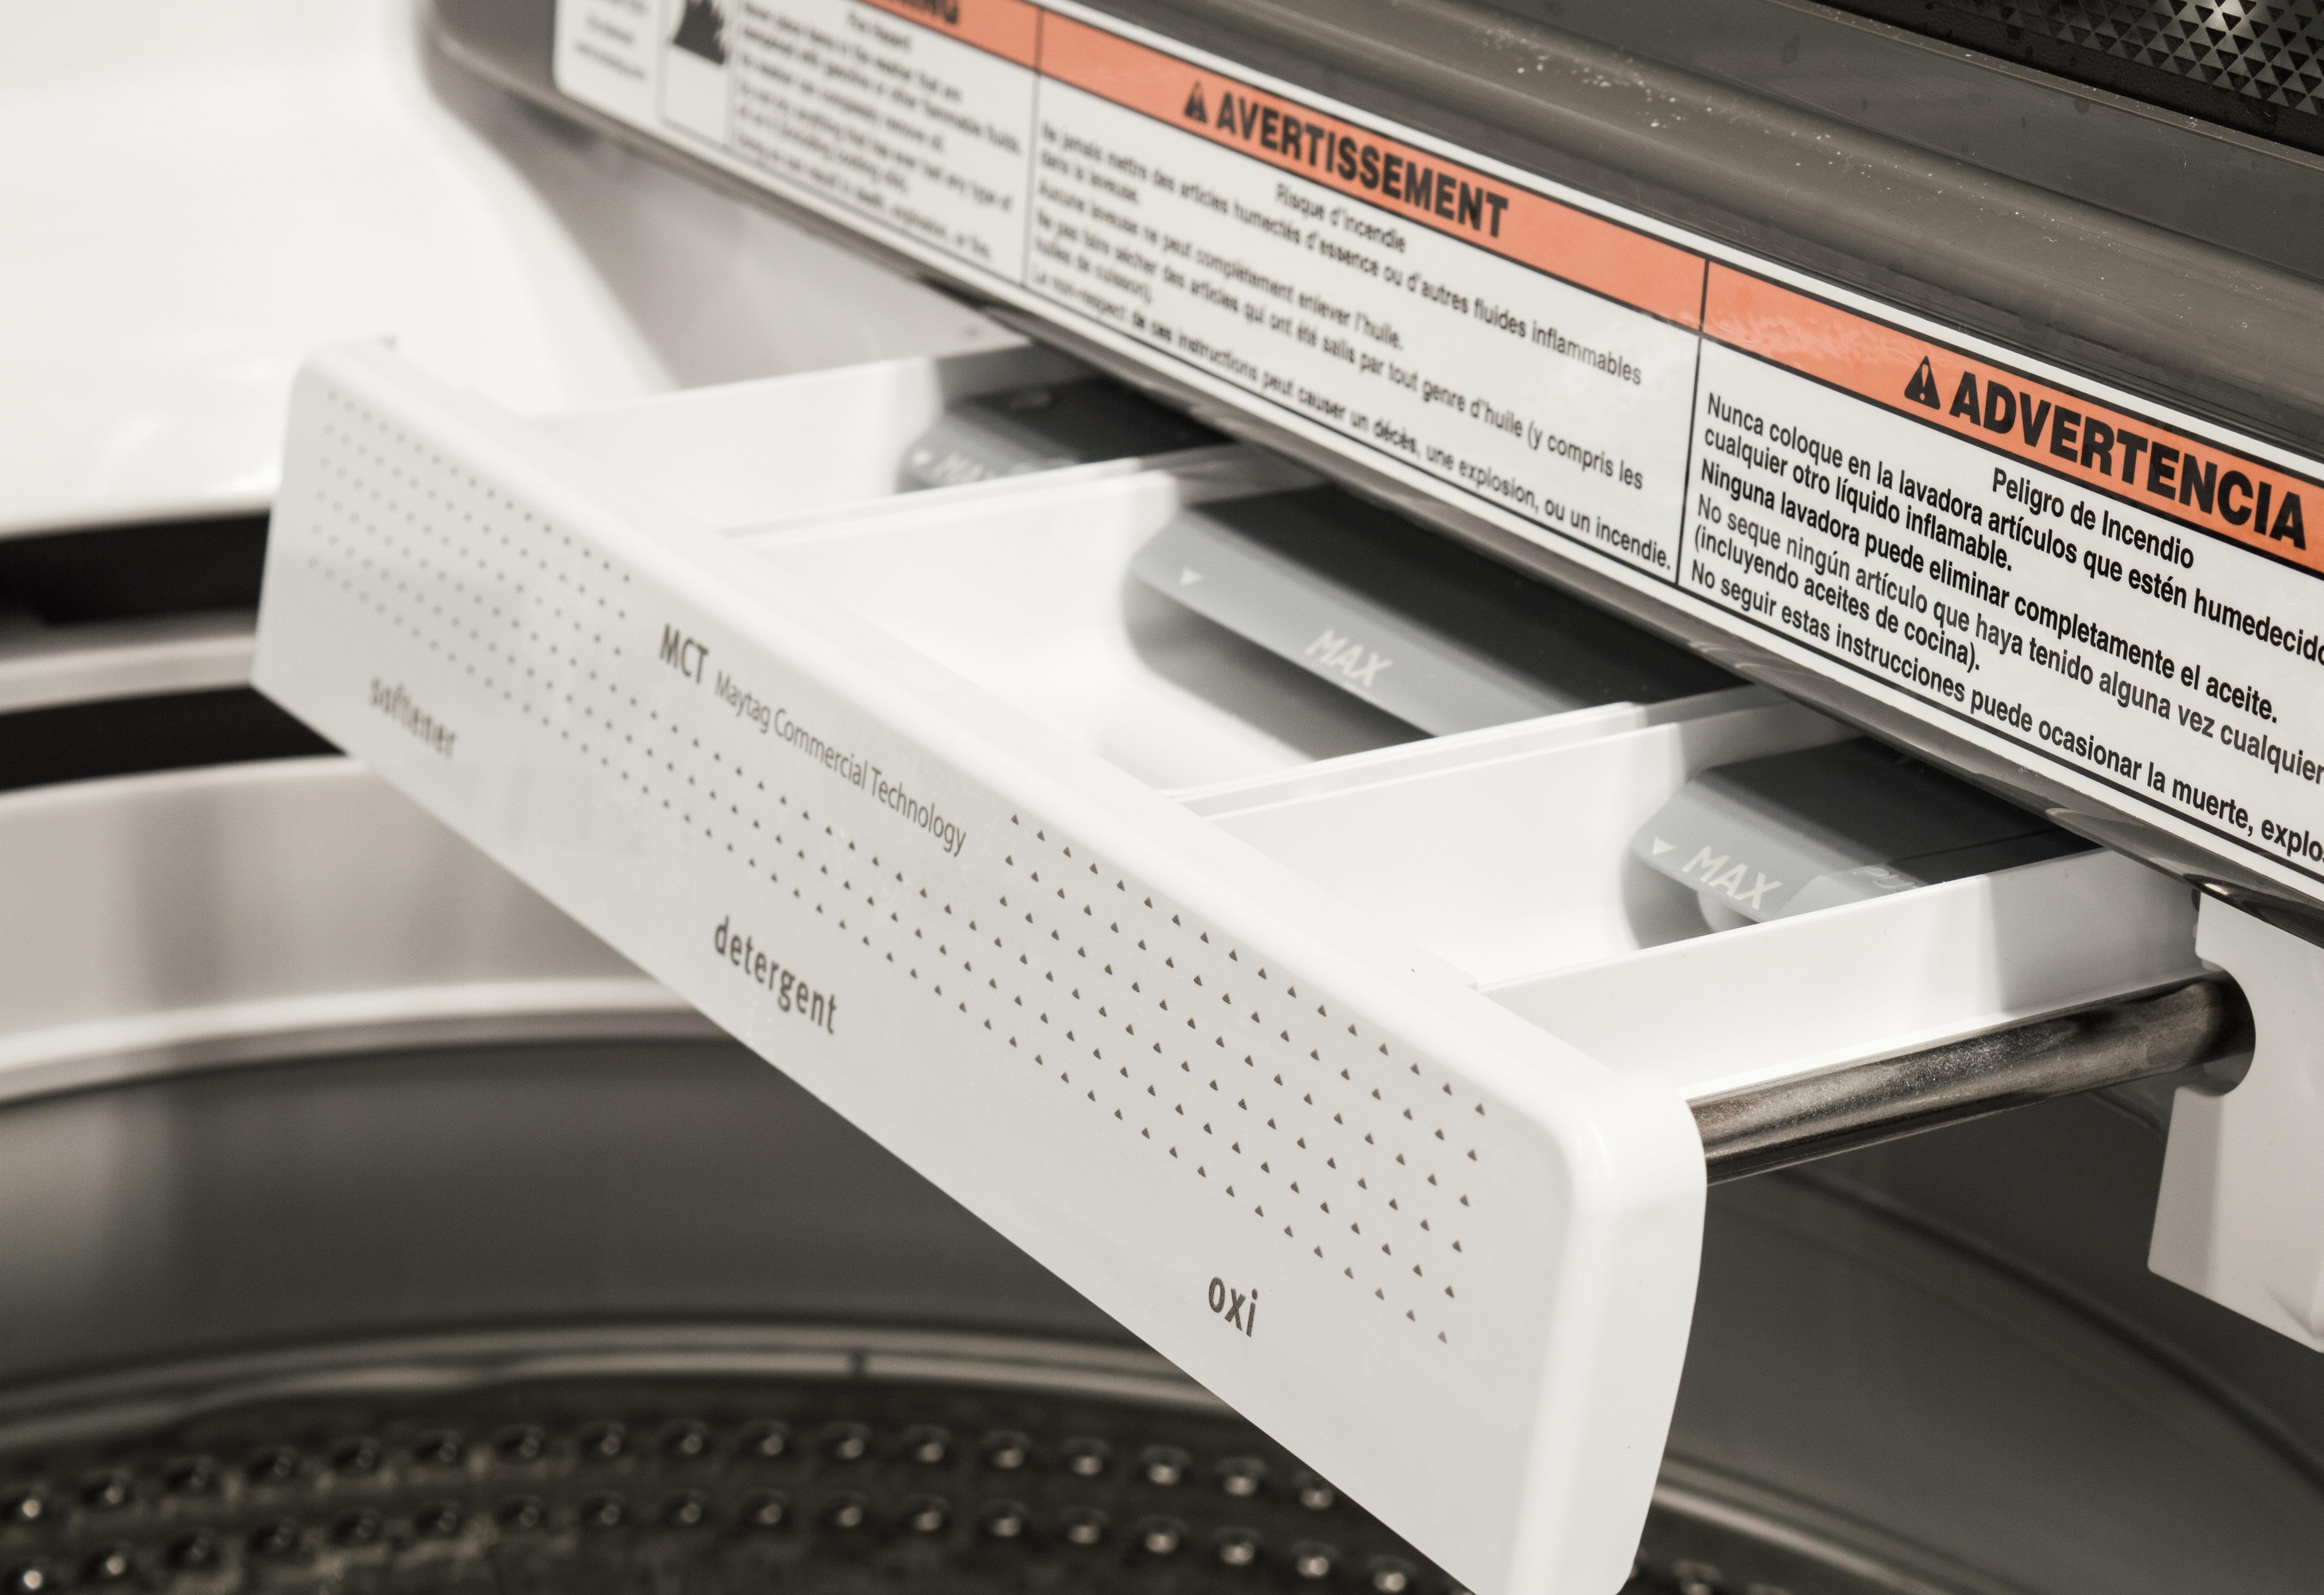 Metal rails lets the detergent dispenser open smoothly.